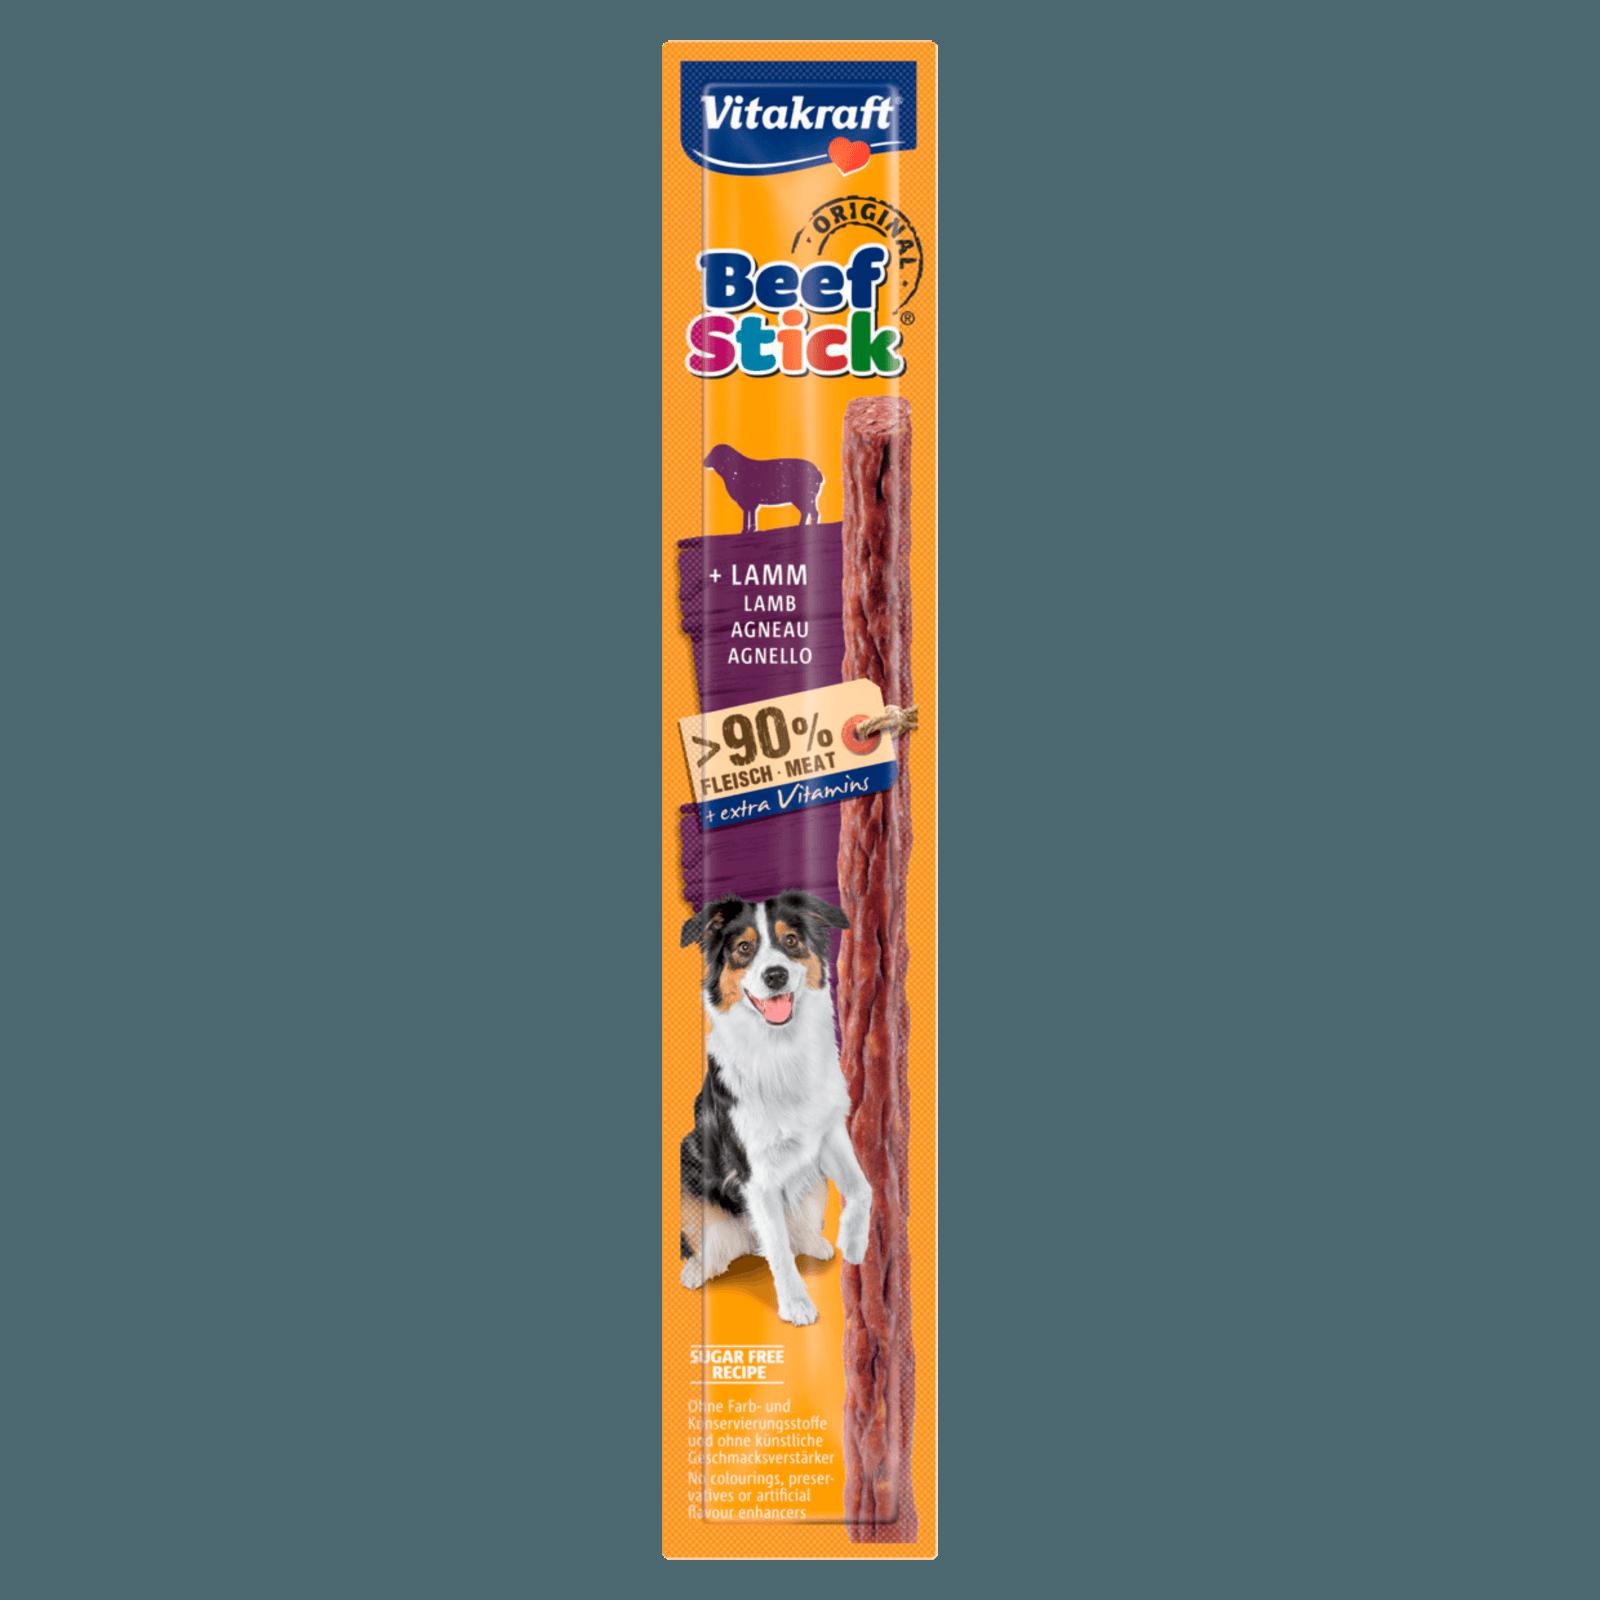 Vitakraft Beef-Stick Original Lamm 1 Stück